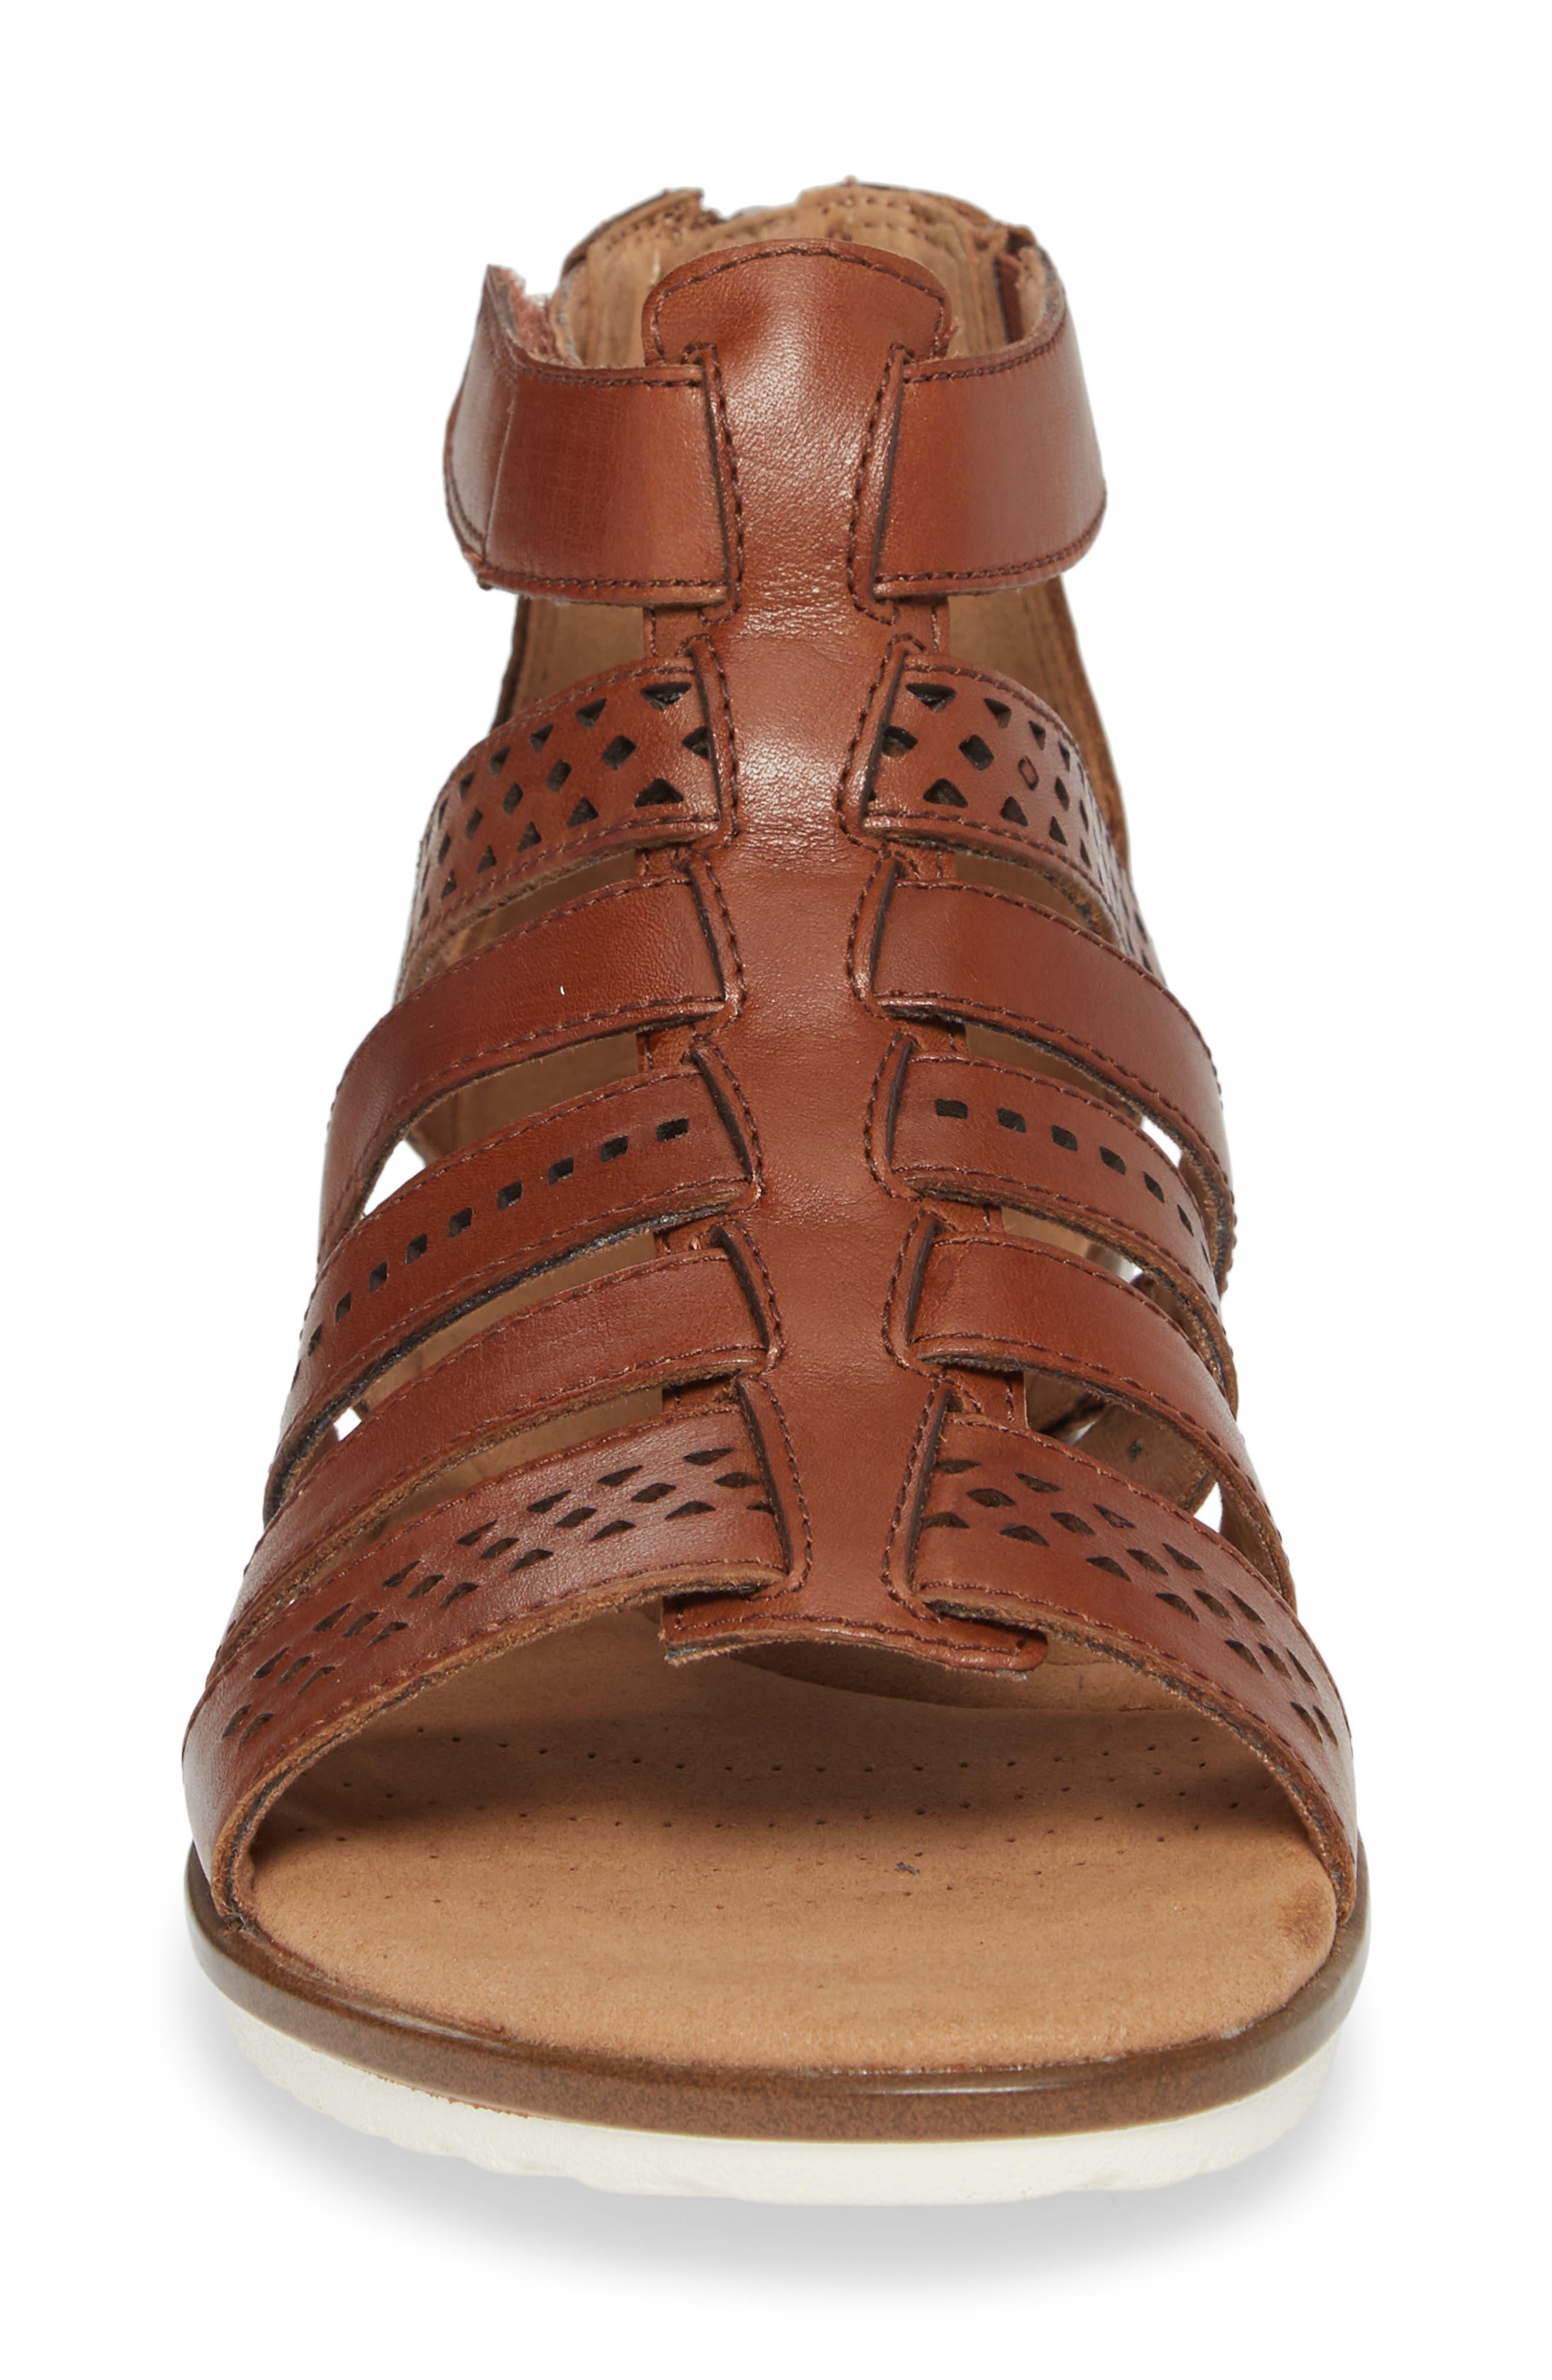 Kele Lotus Sandal,                             Alternate thumbnail 4, color,                             Beige Leather